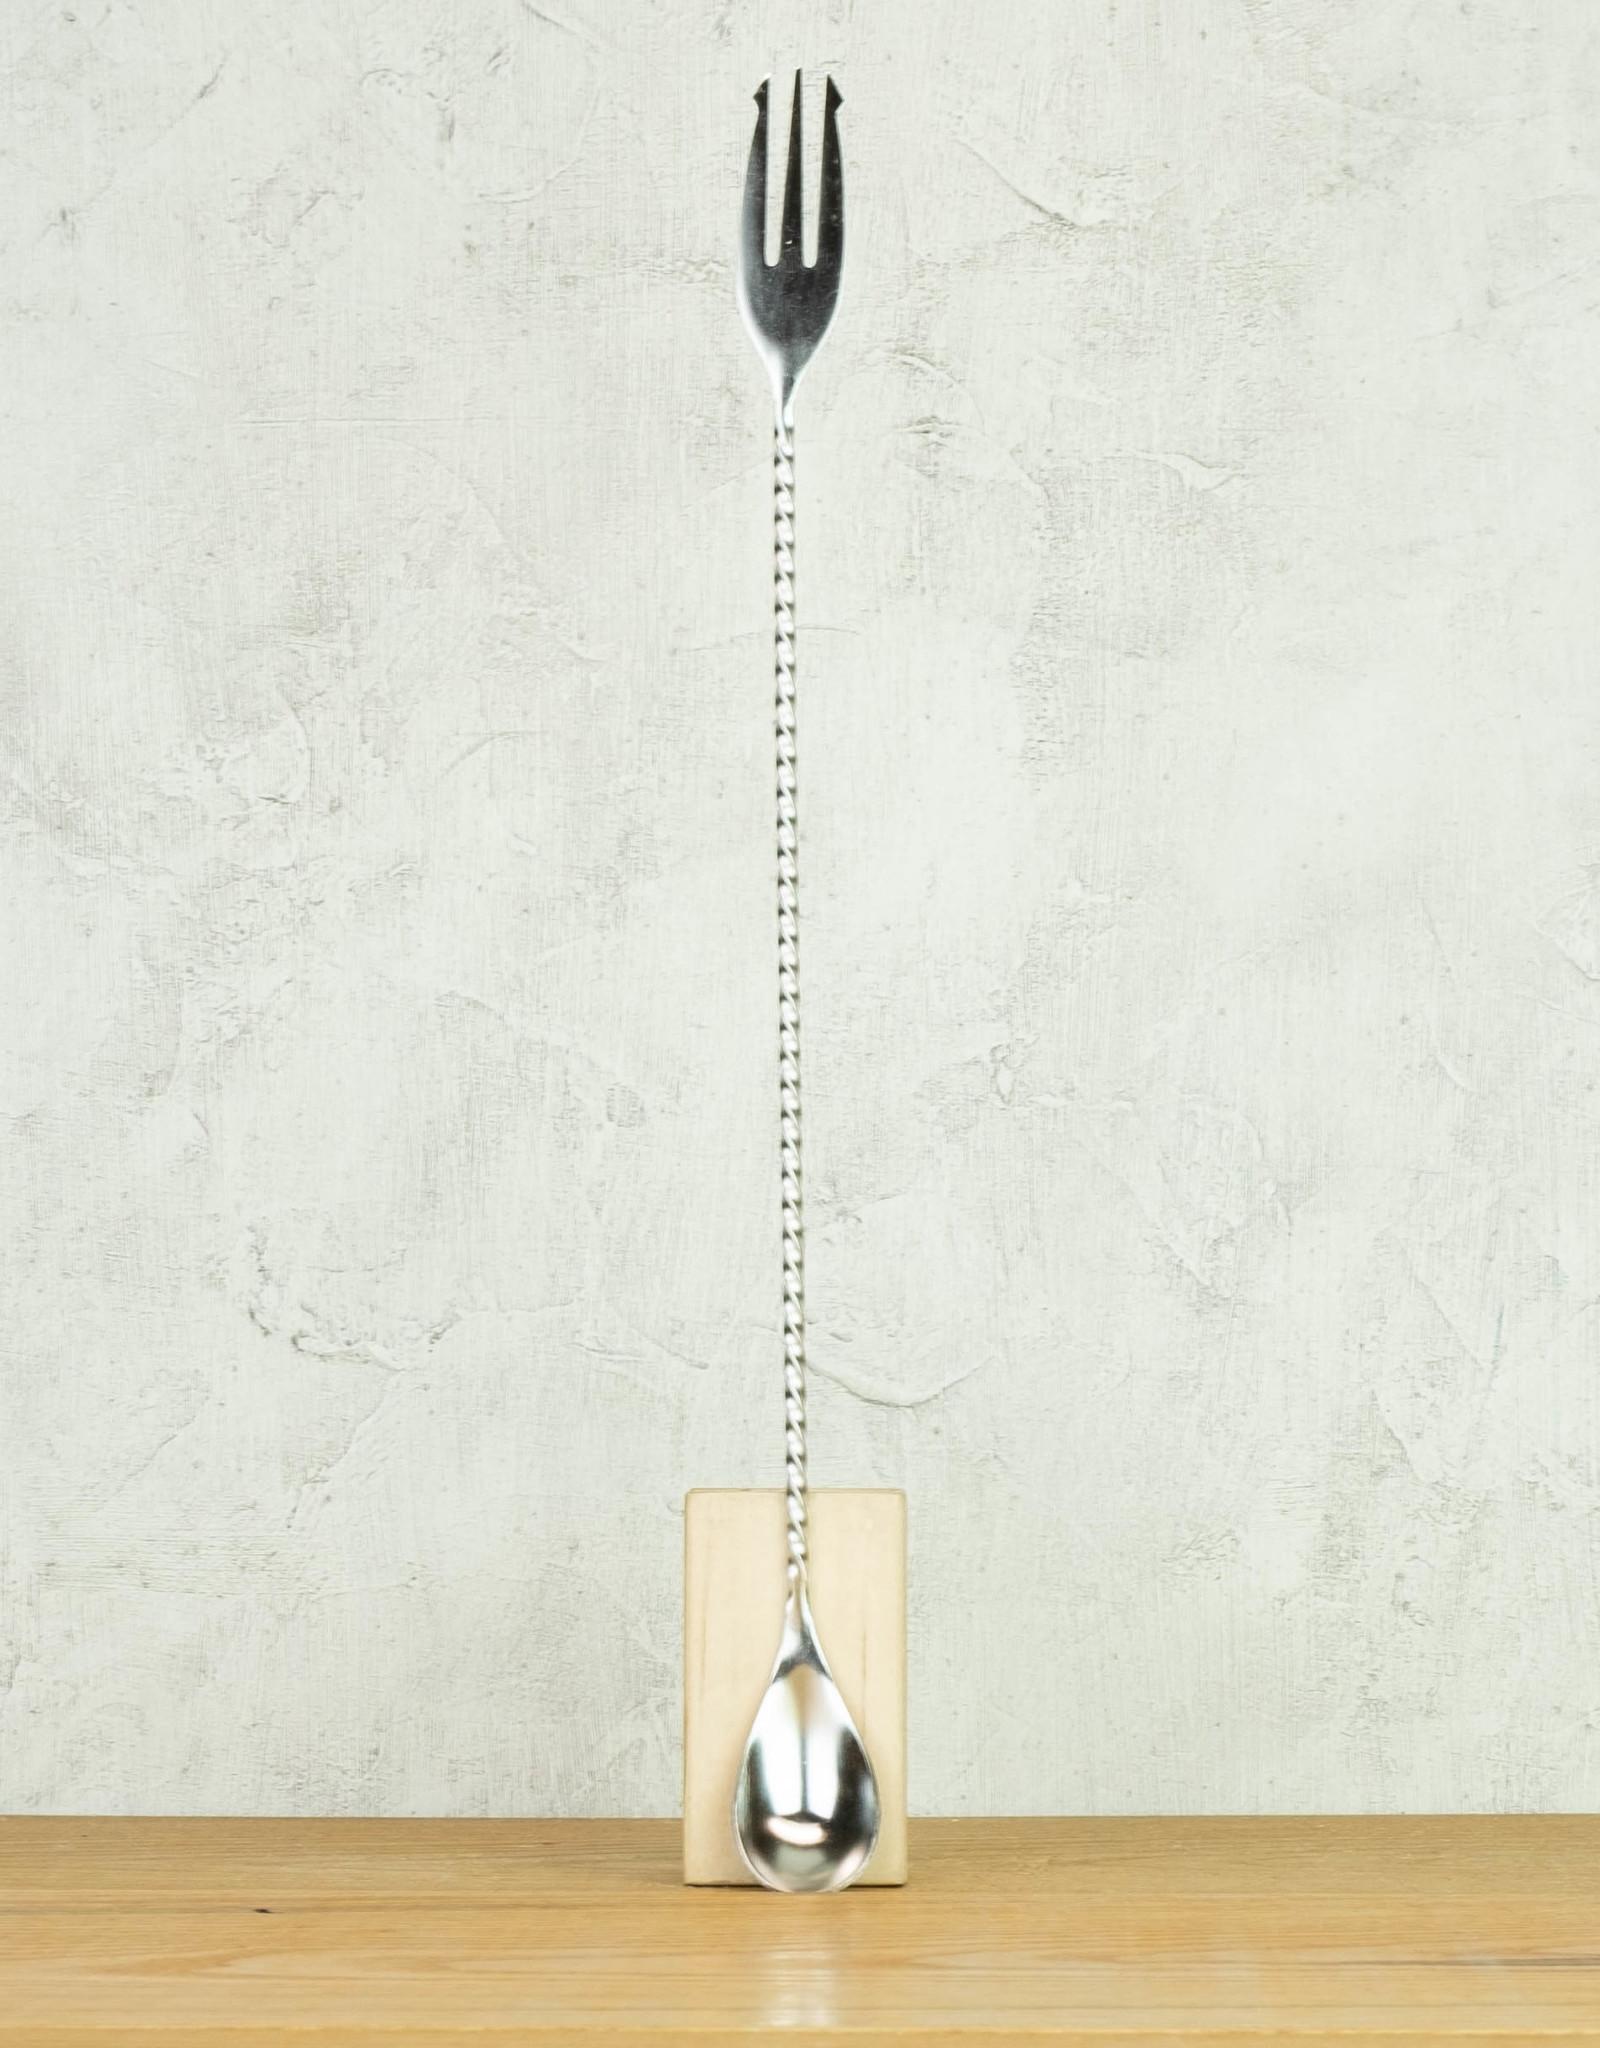 Cocktail Kingdom Trident Barspoon